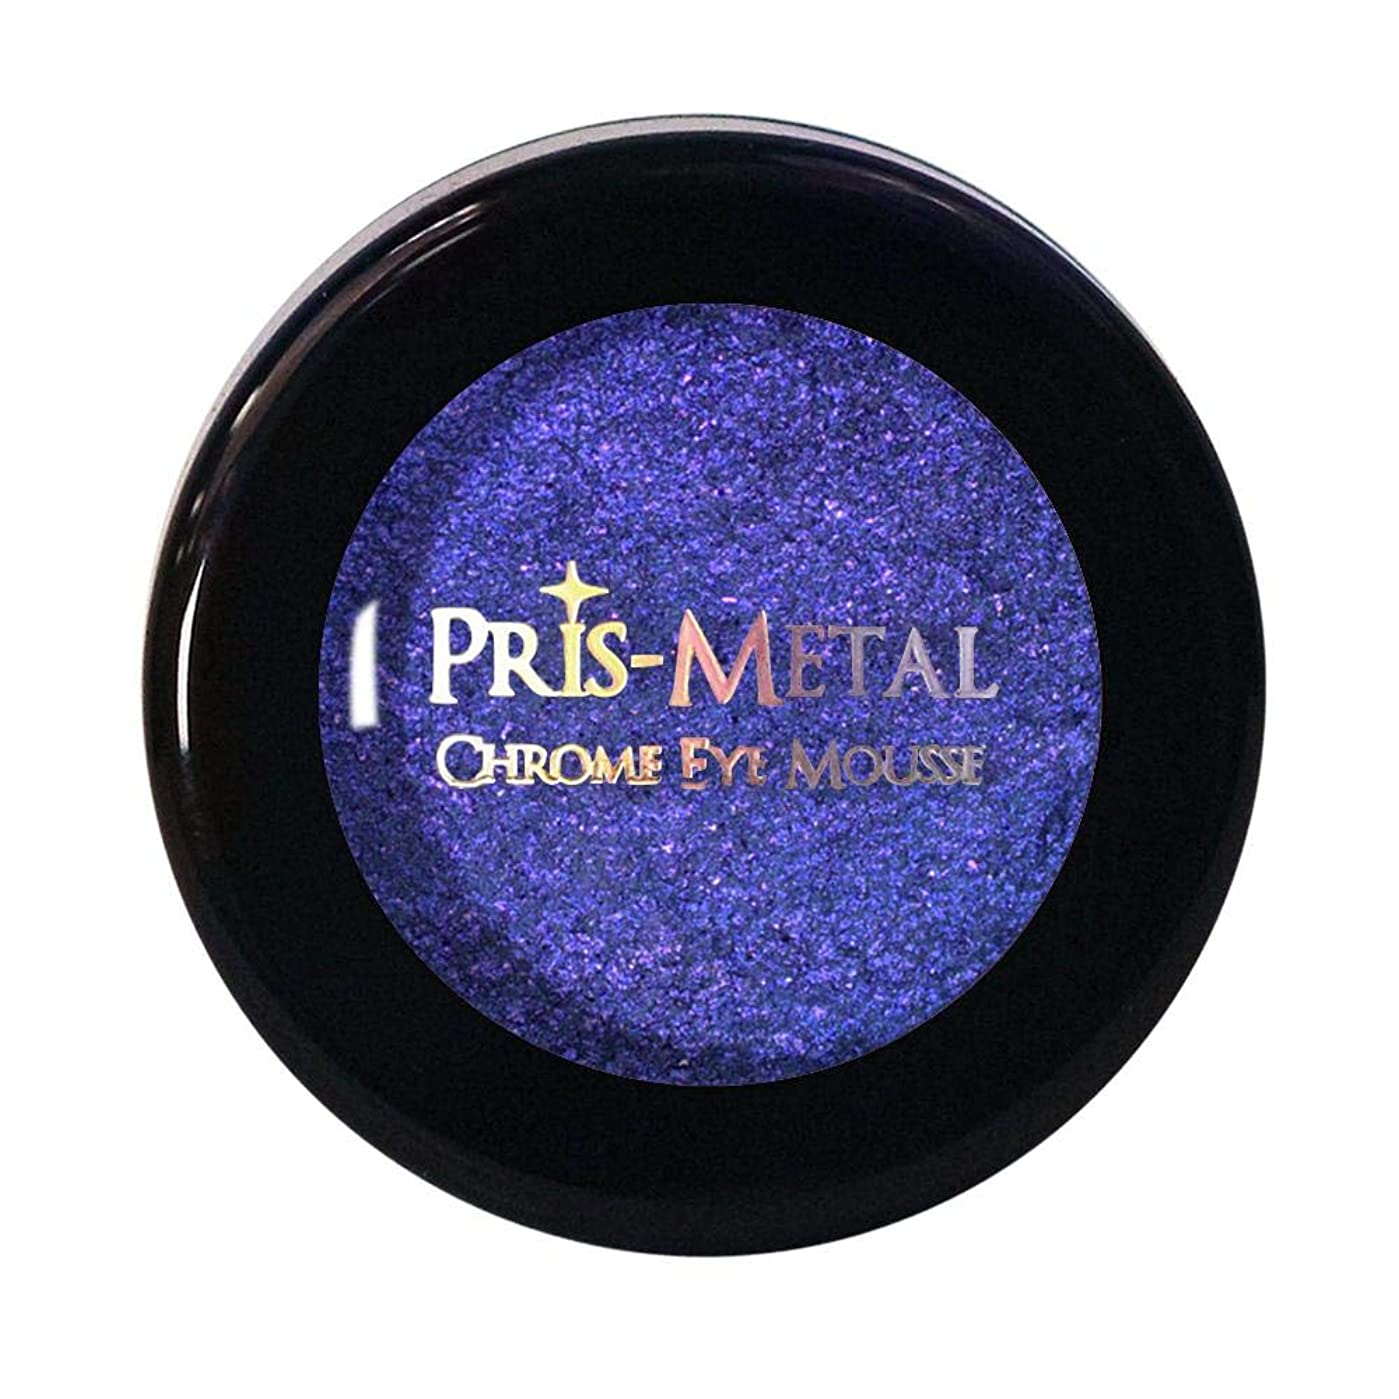 悲惨な予測消費者J. CAT BEAUTY Pris-Metal Chrome Eye Mousse - Poppin Lockin (並行輸入品)